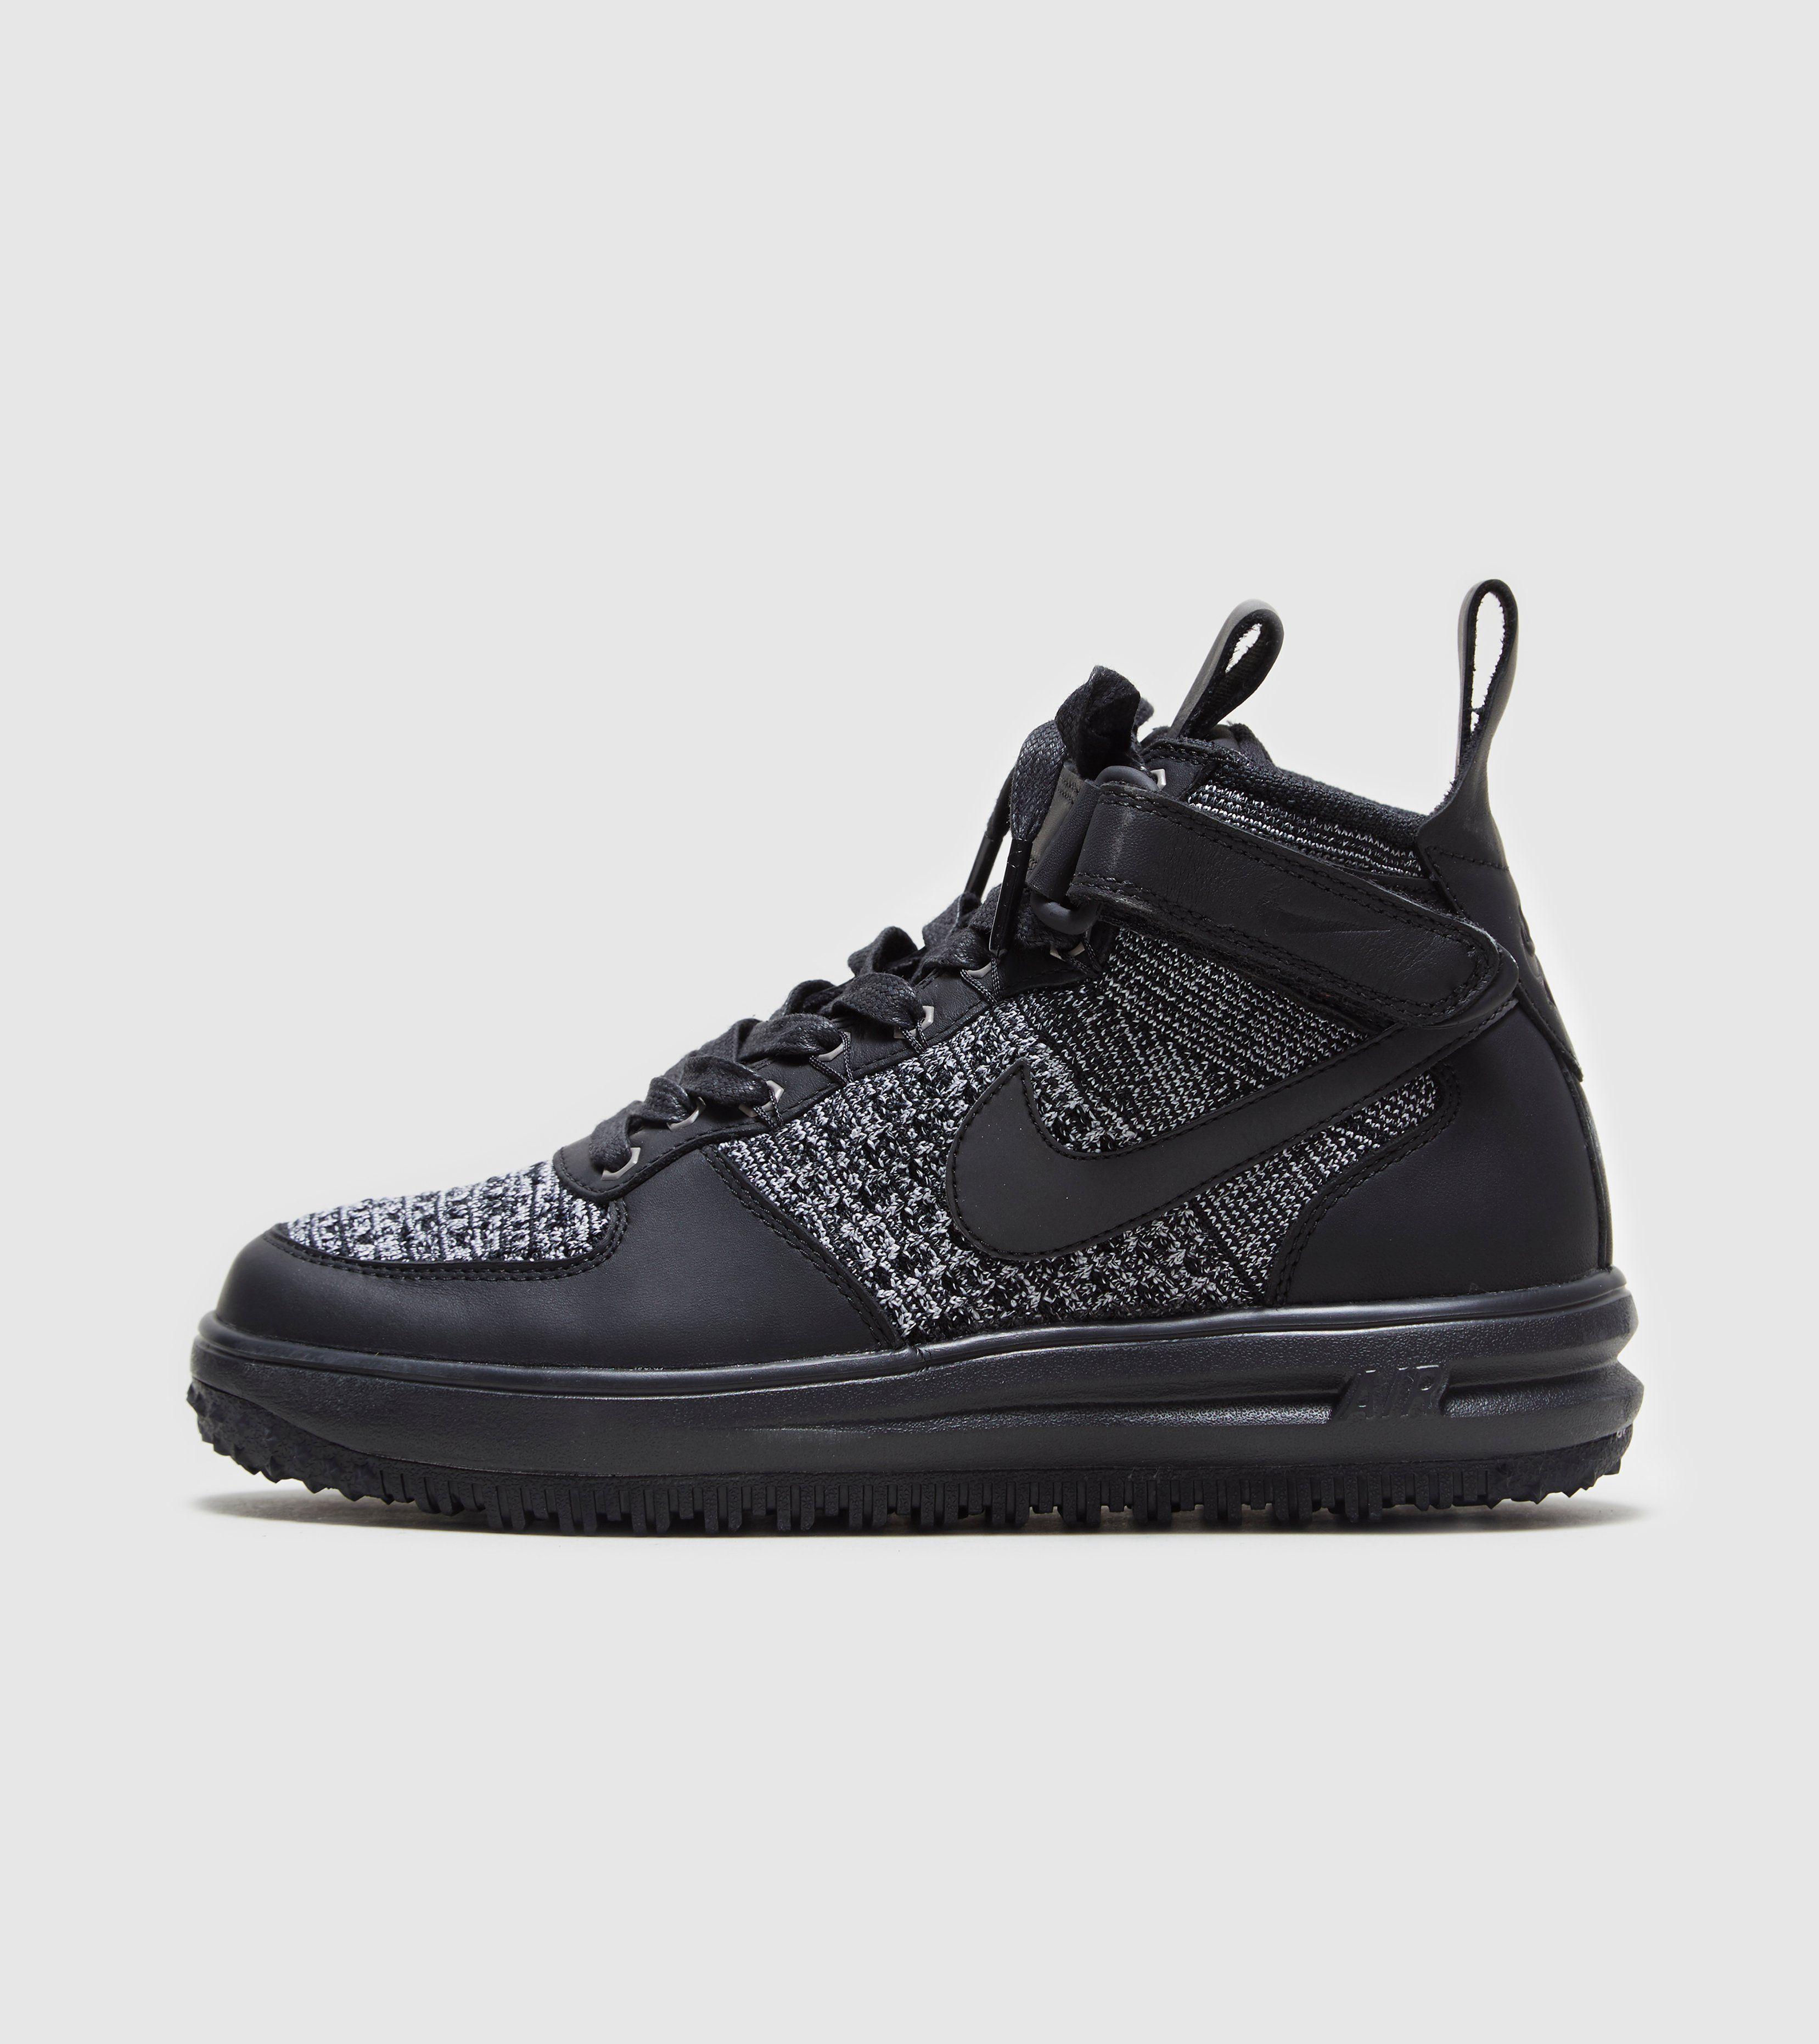 outlet store f6288 063dc Nike Lunar Force 1 Flyknit Workboot Women s   Size